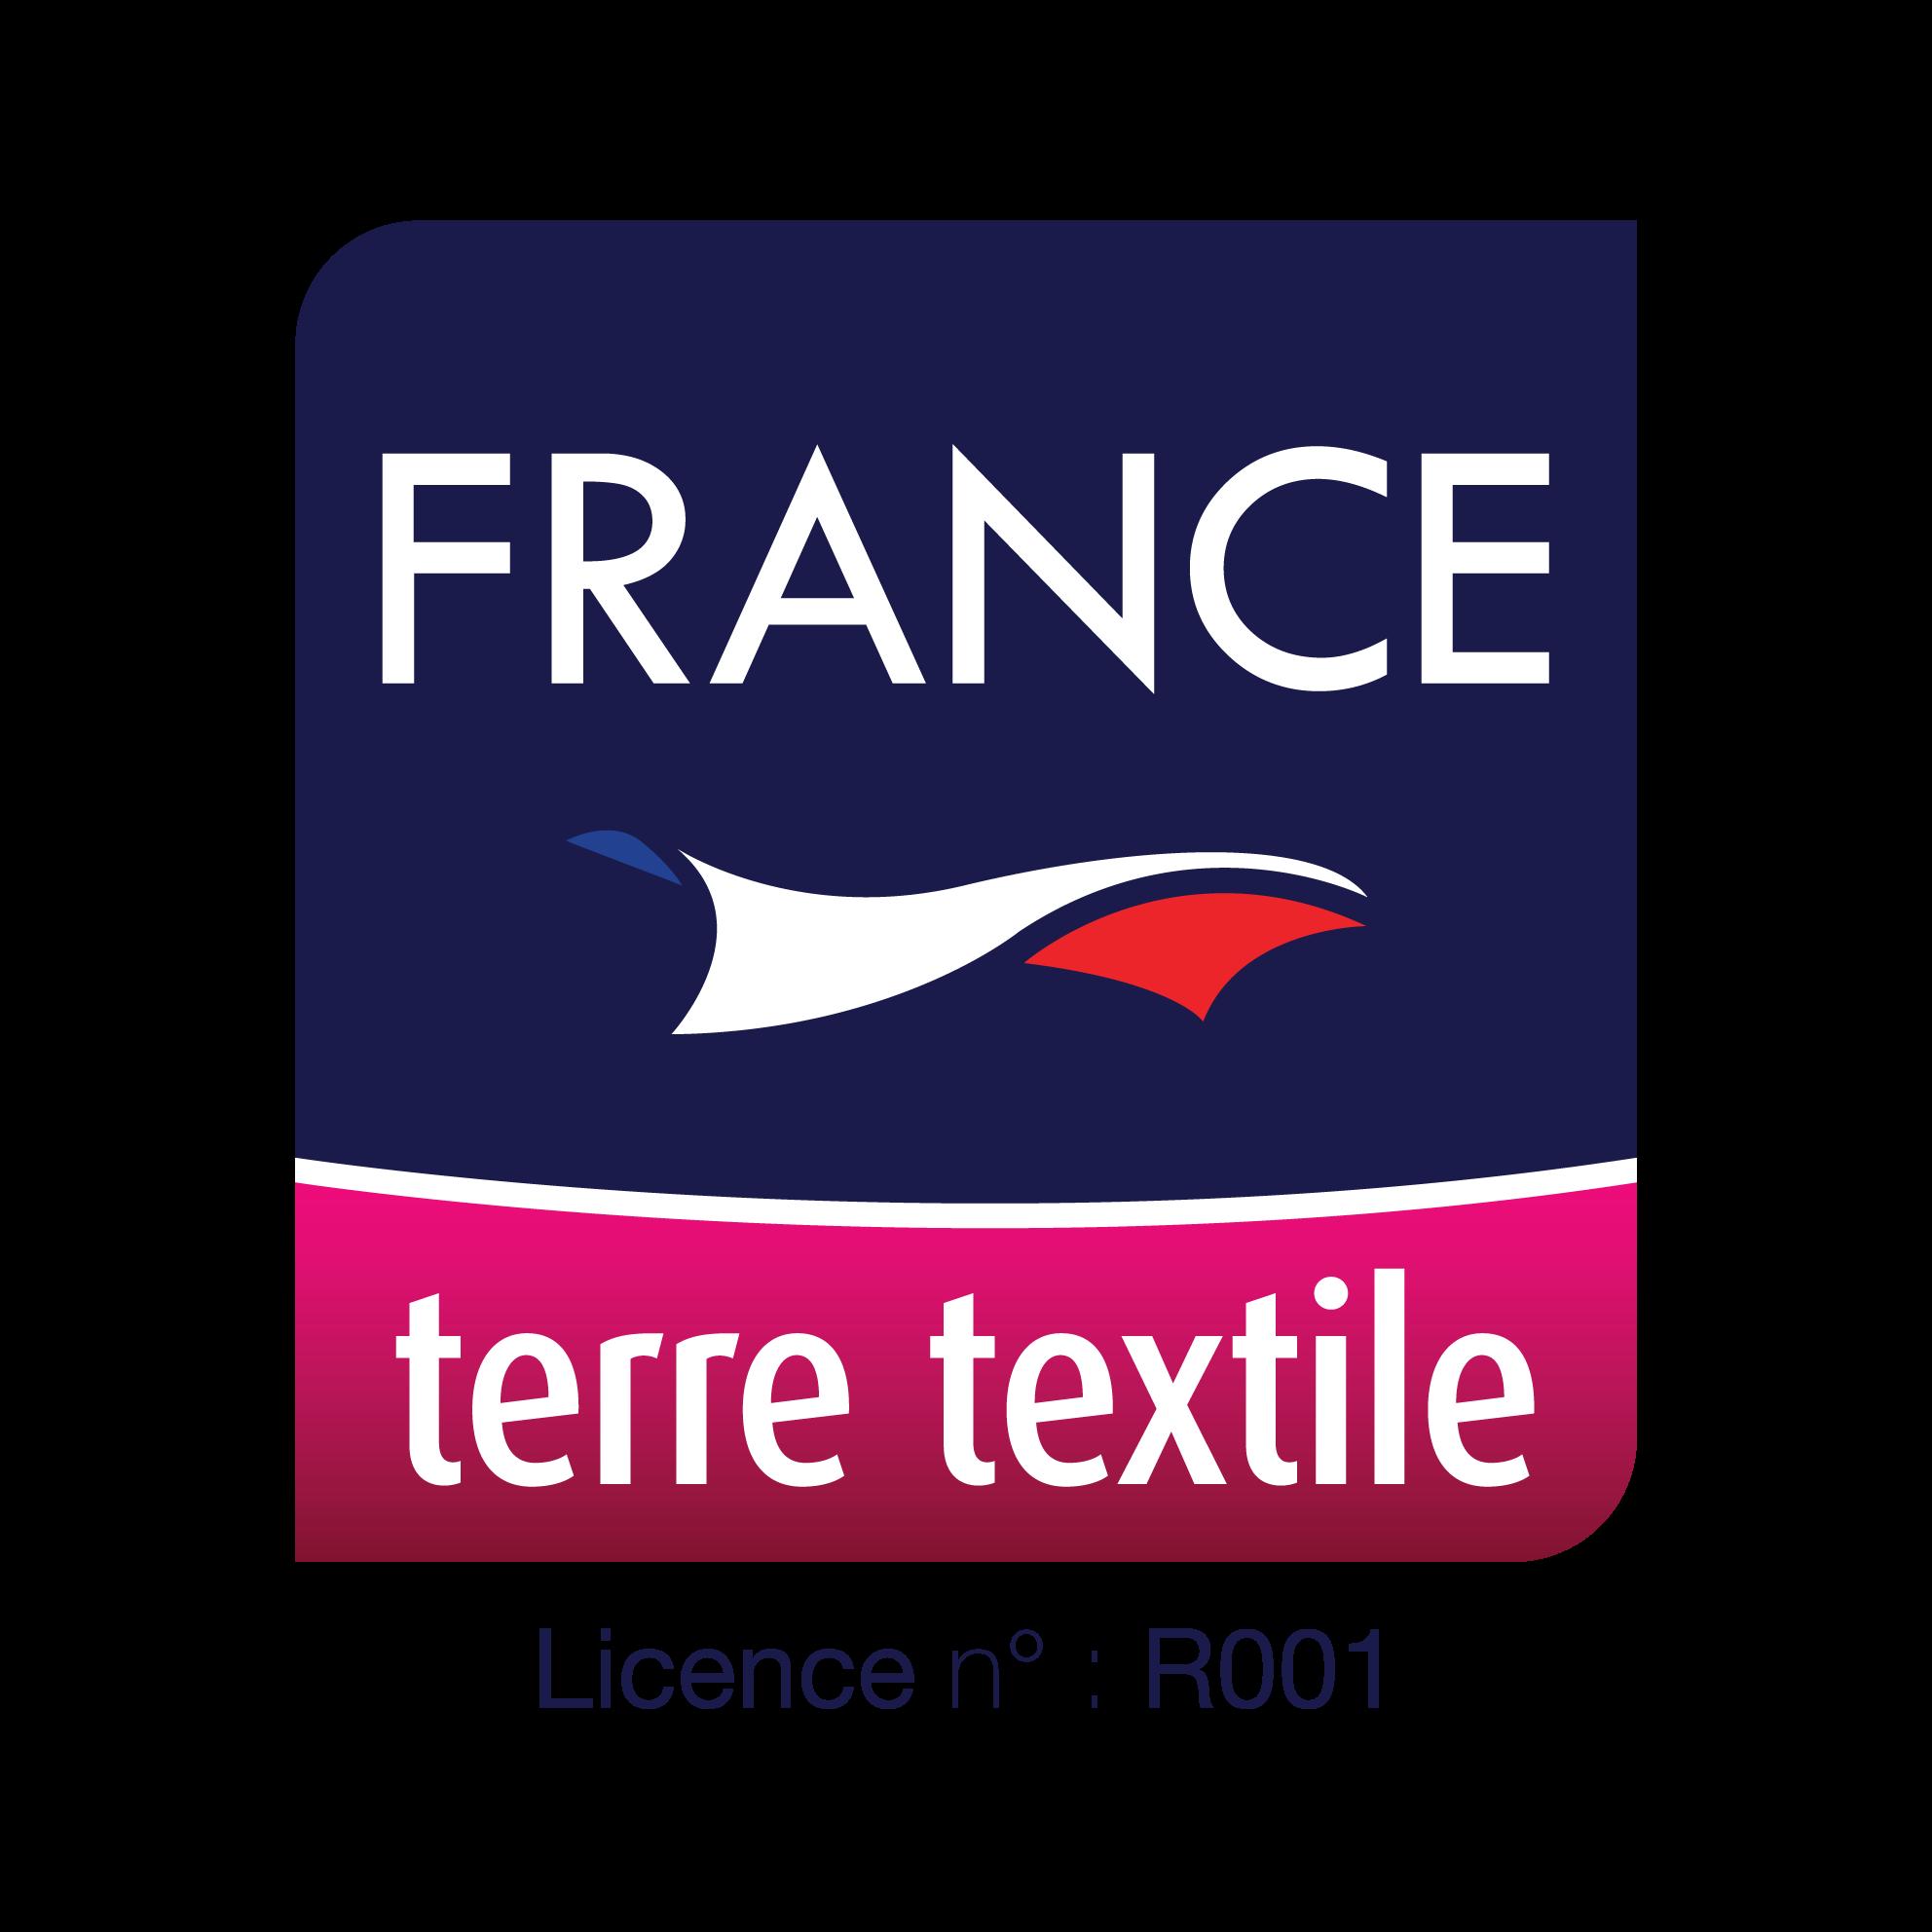 France Terre Textile - Certification Indispensac